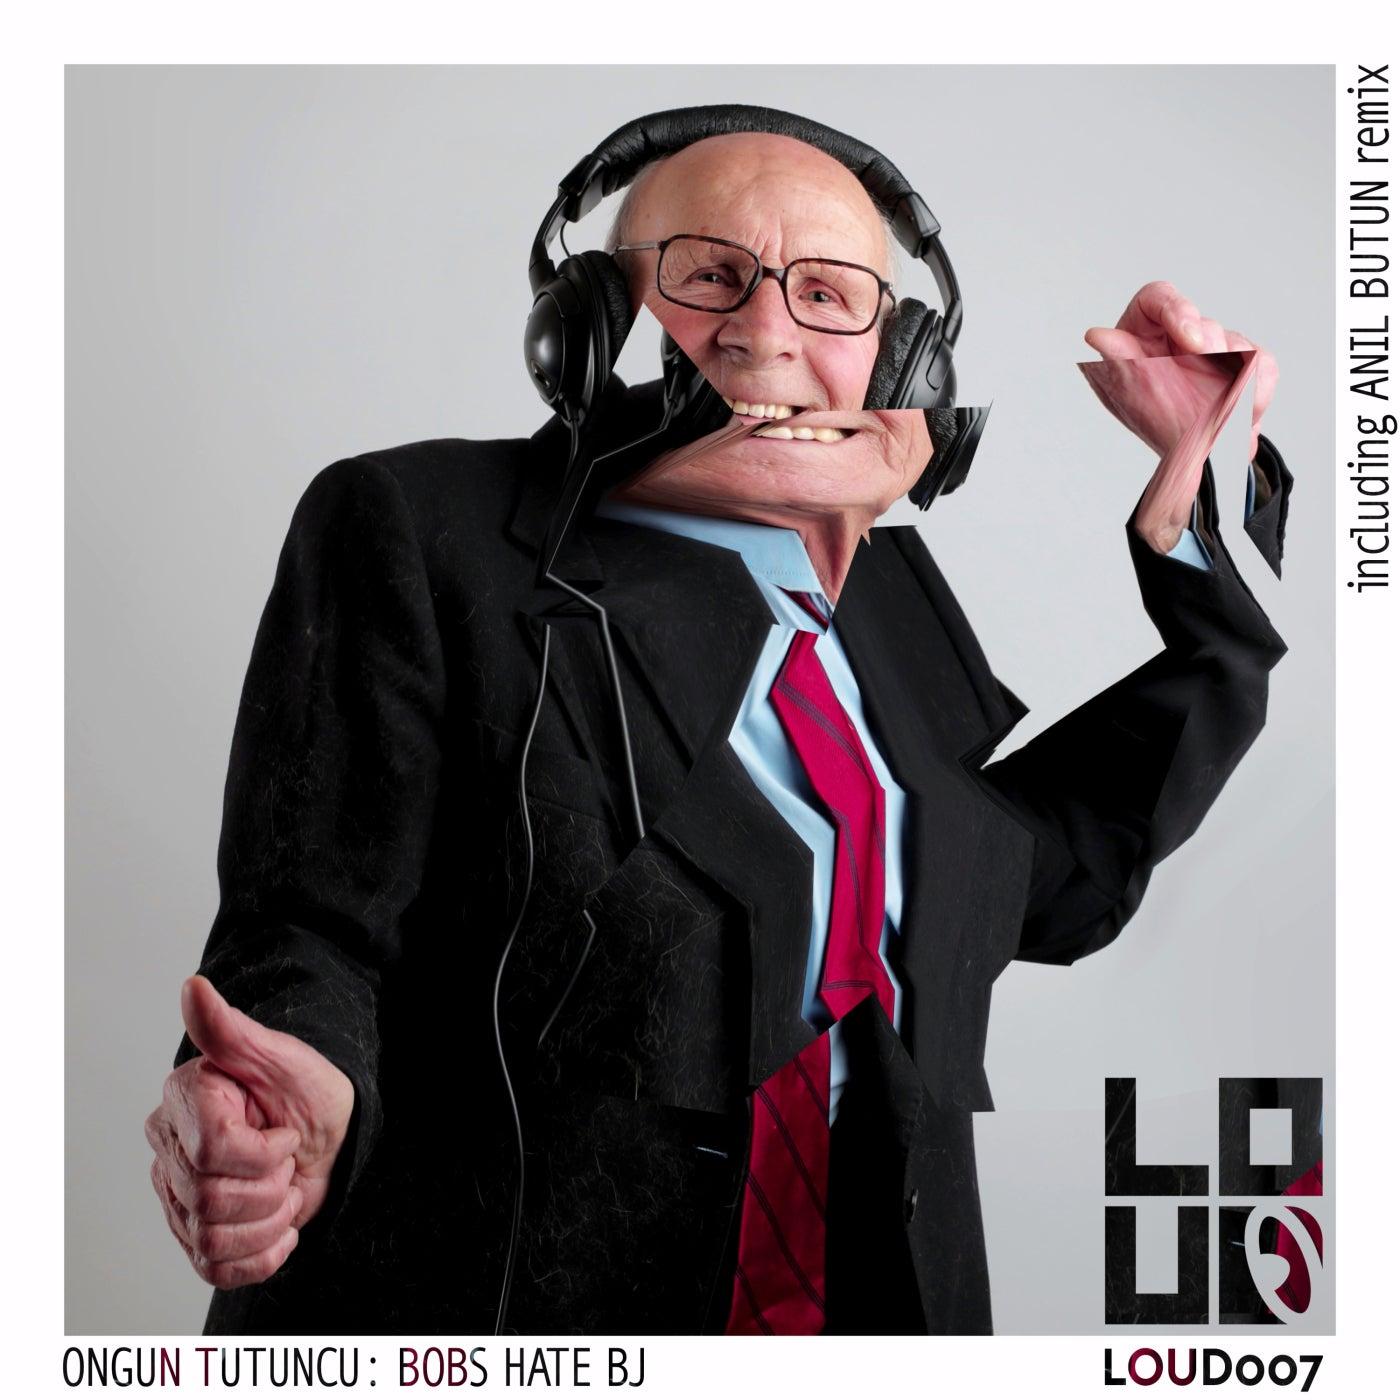 Bobs Hate BJ (Original Mix)